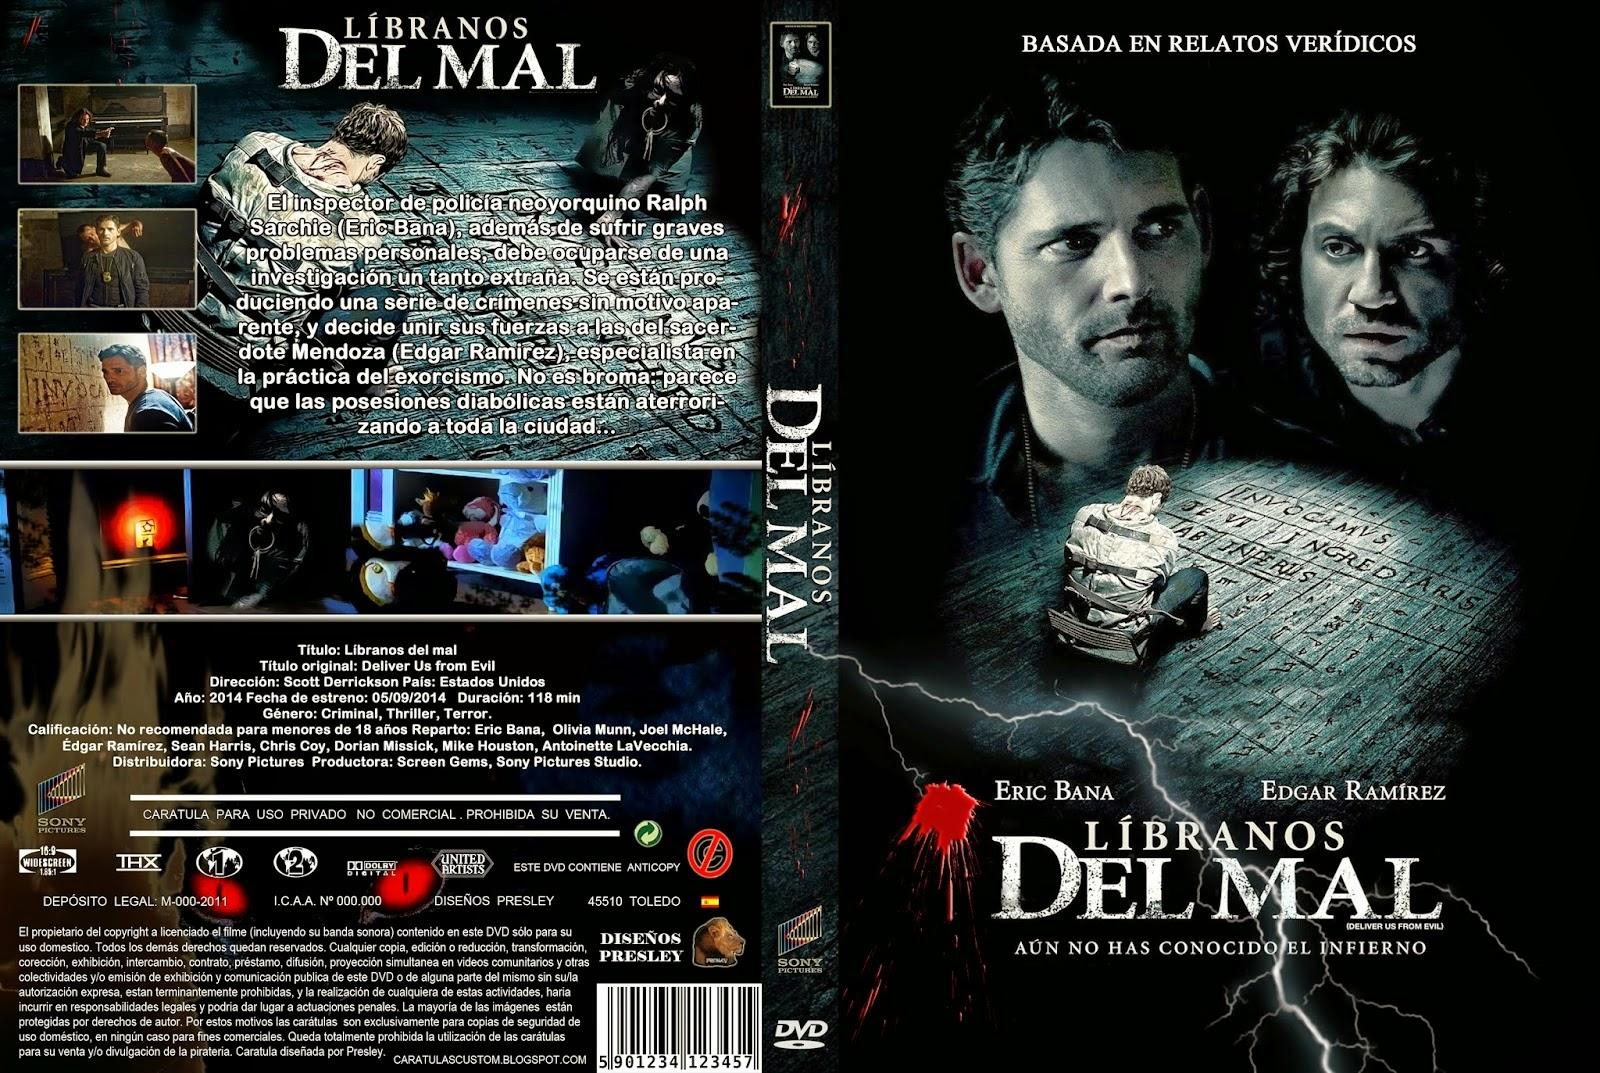 Libranos Del Mal DVD